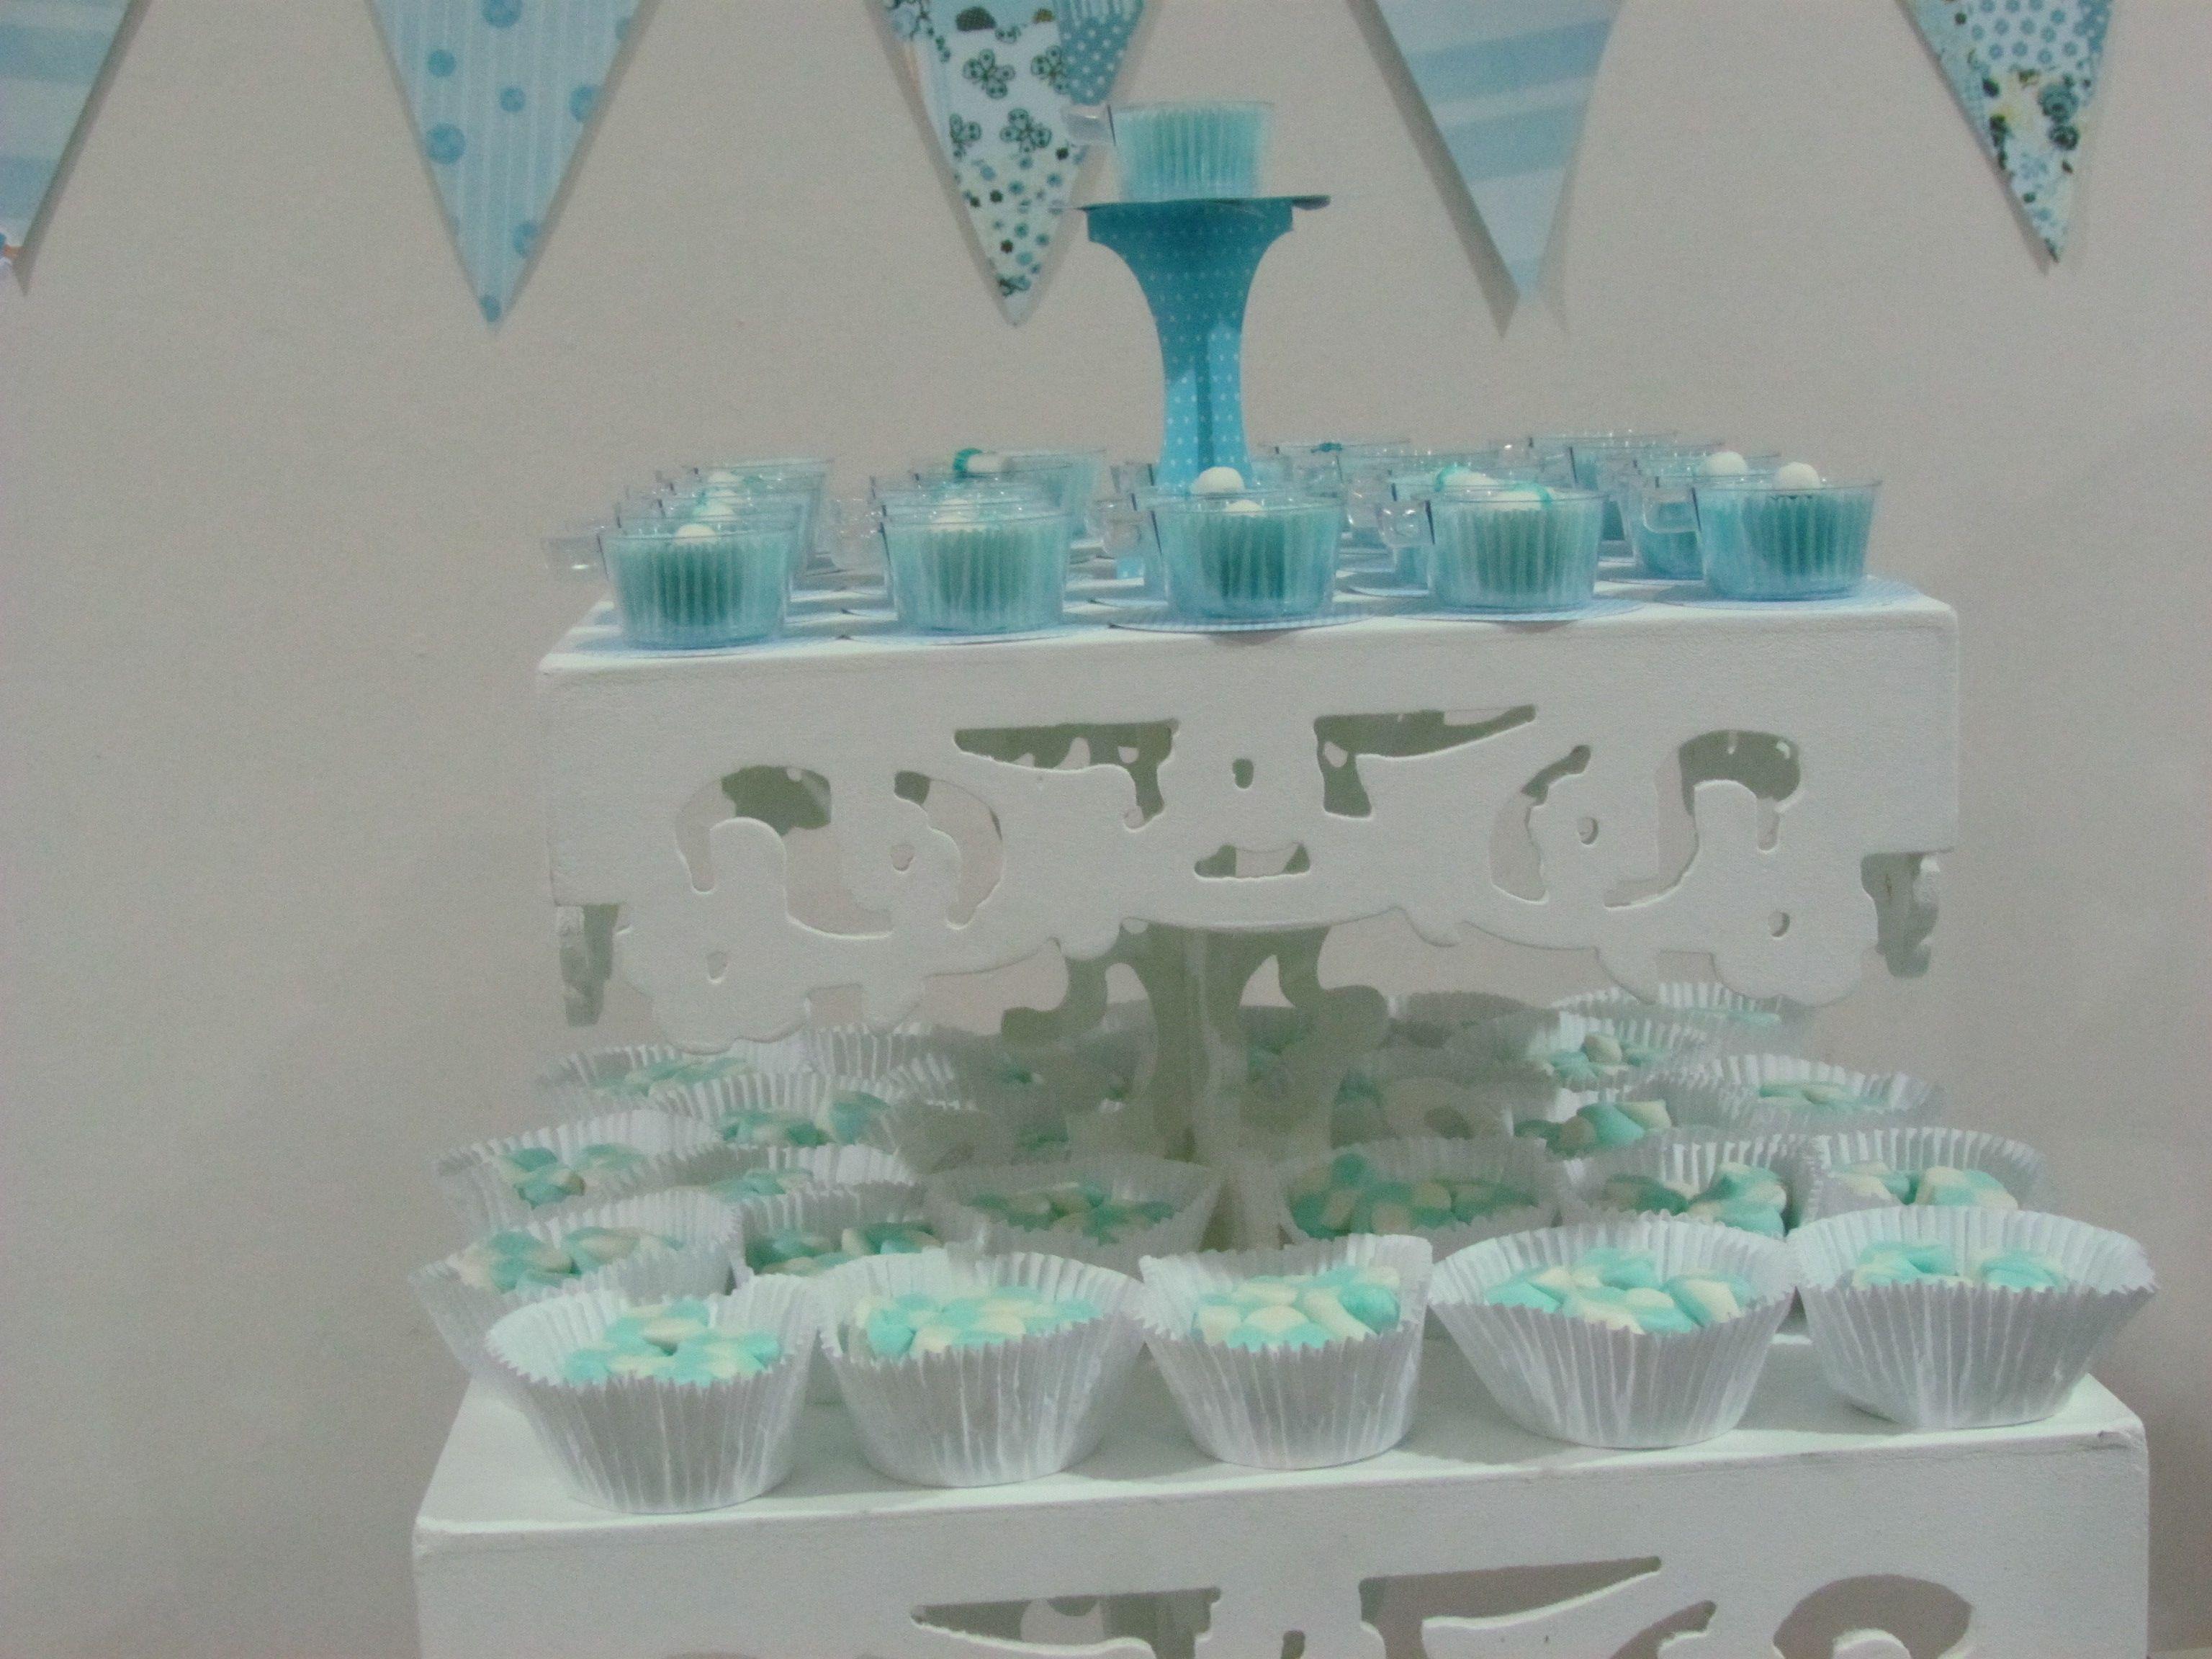 Chá de bebê junino - Marsmallows azuis e brancos